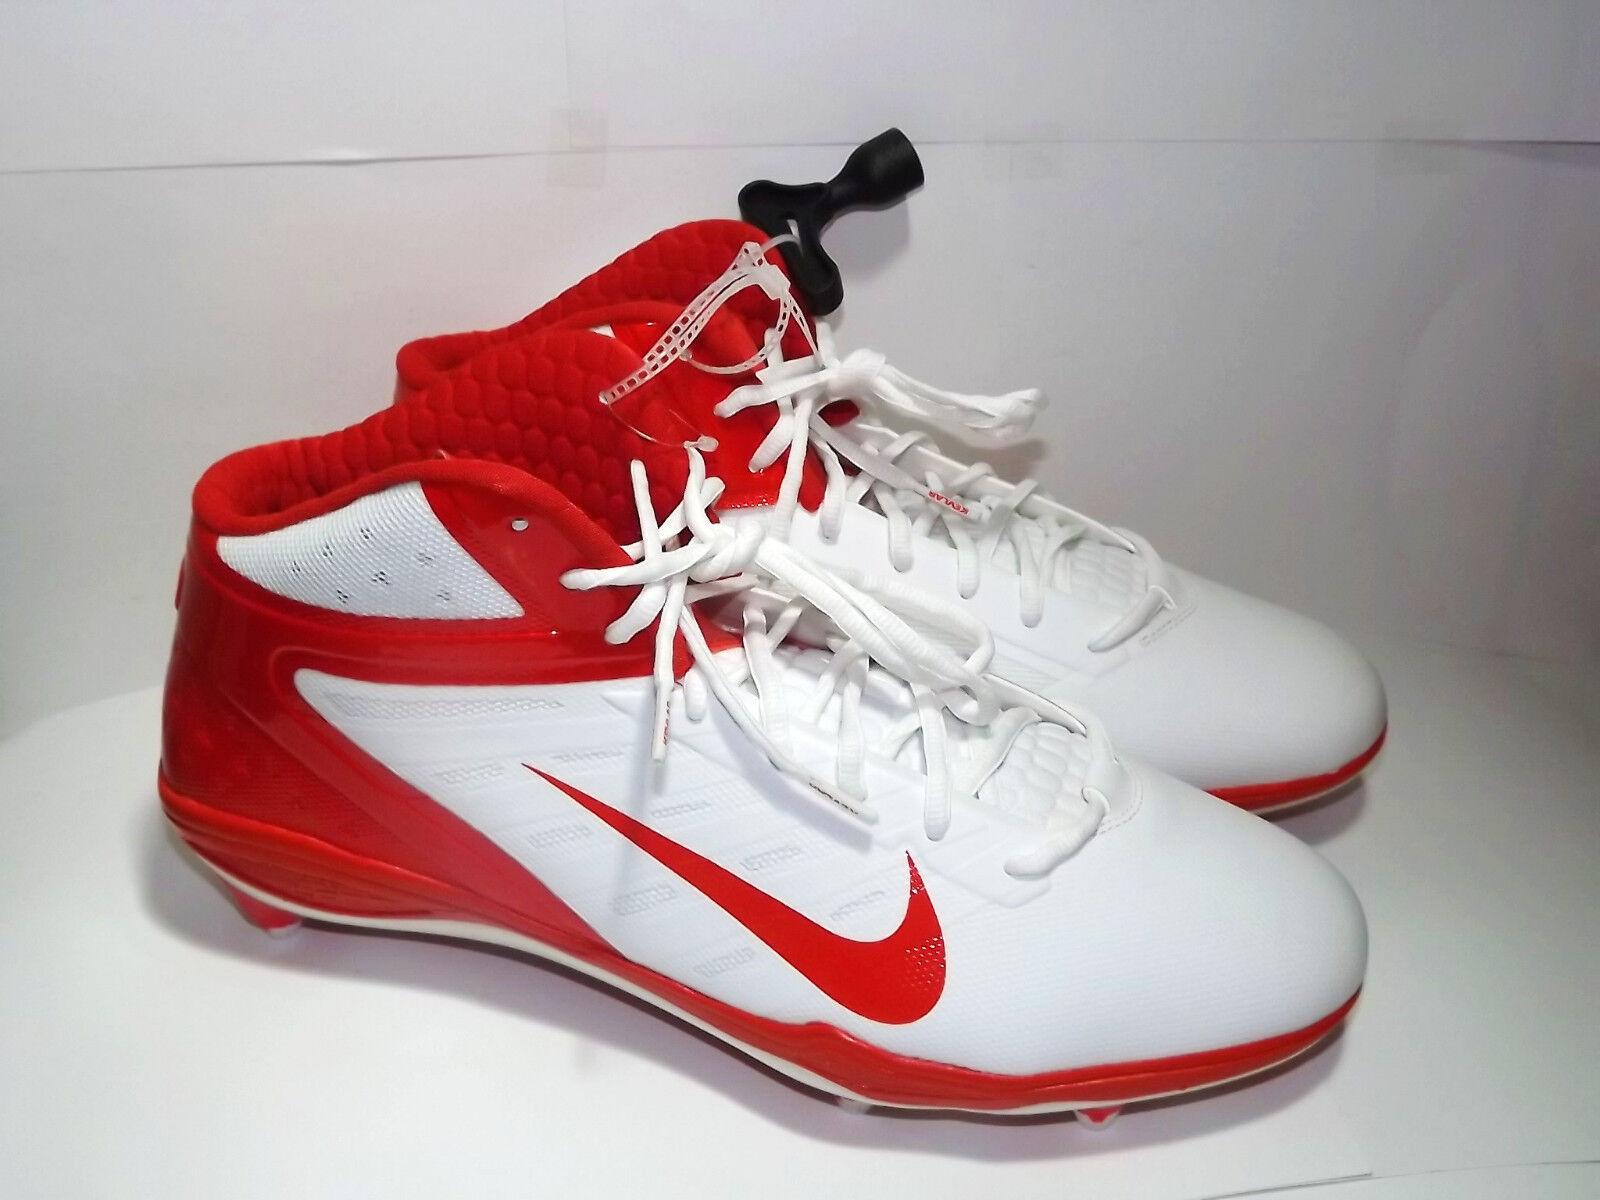 MENS NIKE ALPHA TALON  ELITE D FOOTBALL CLEATS SHOES WHITE ORANGESIZE 15 NEW Brand discount